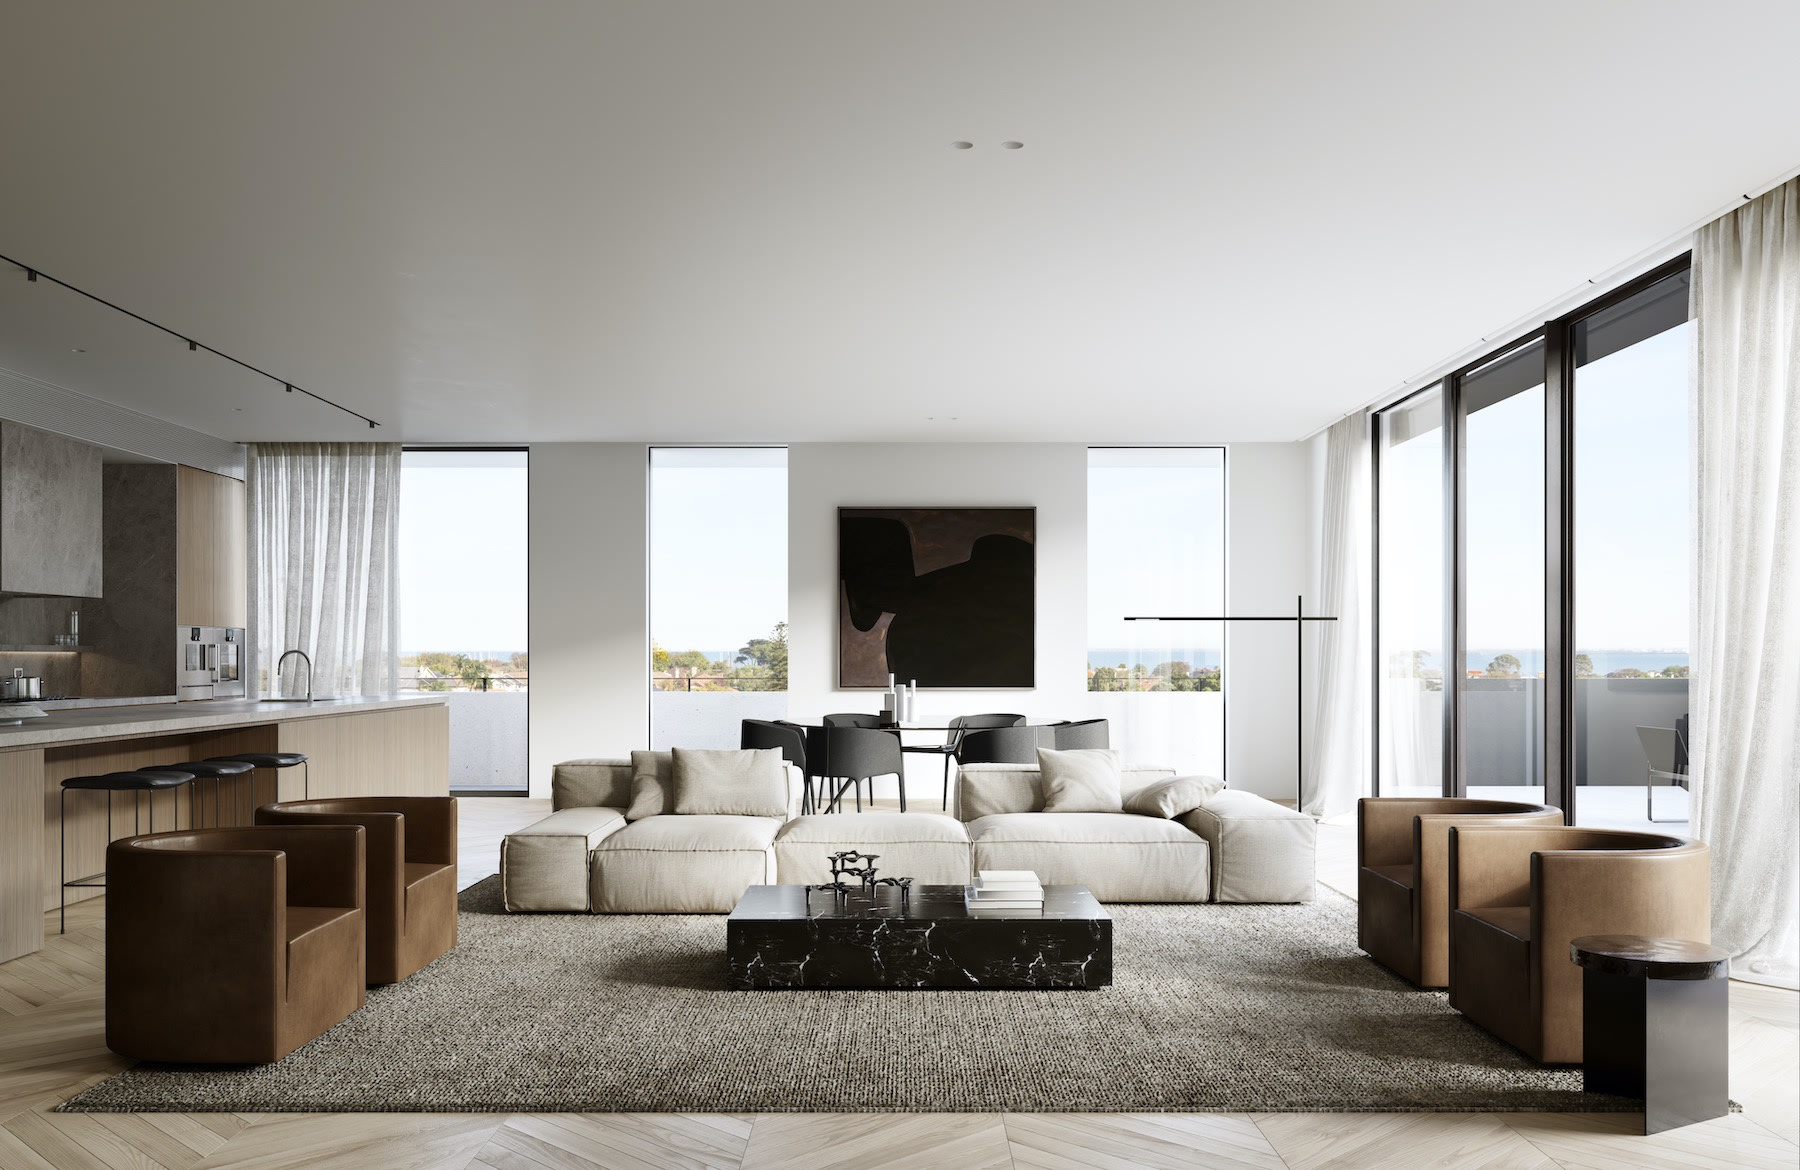 VCON win $50 million contract to build Landream and V-Leader's Brighton apartment development The International